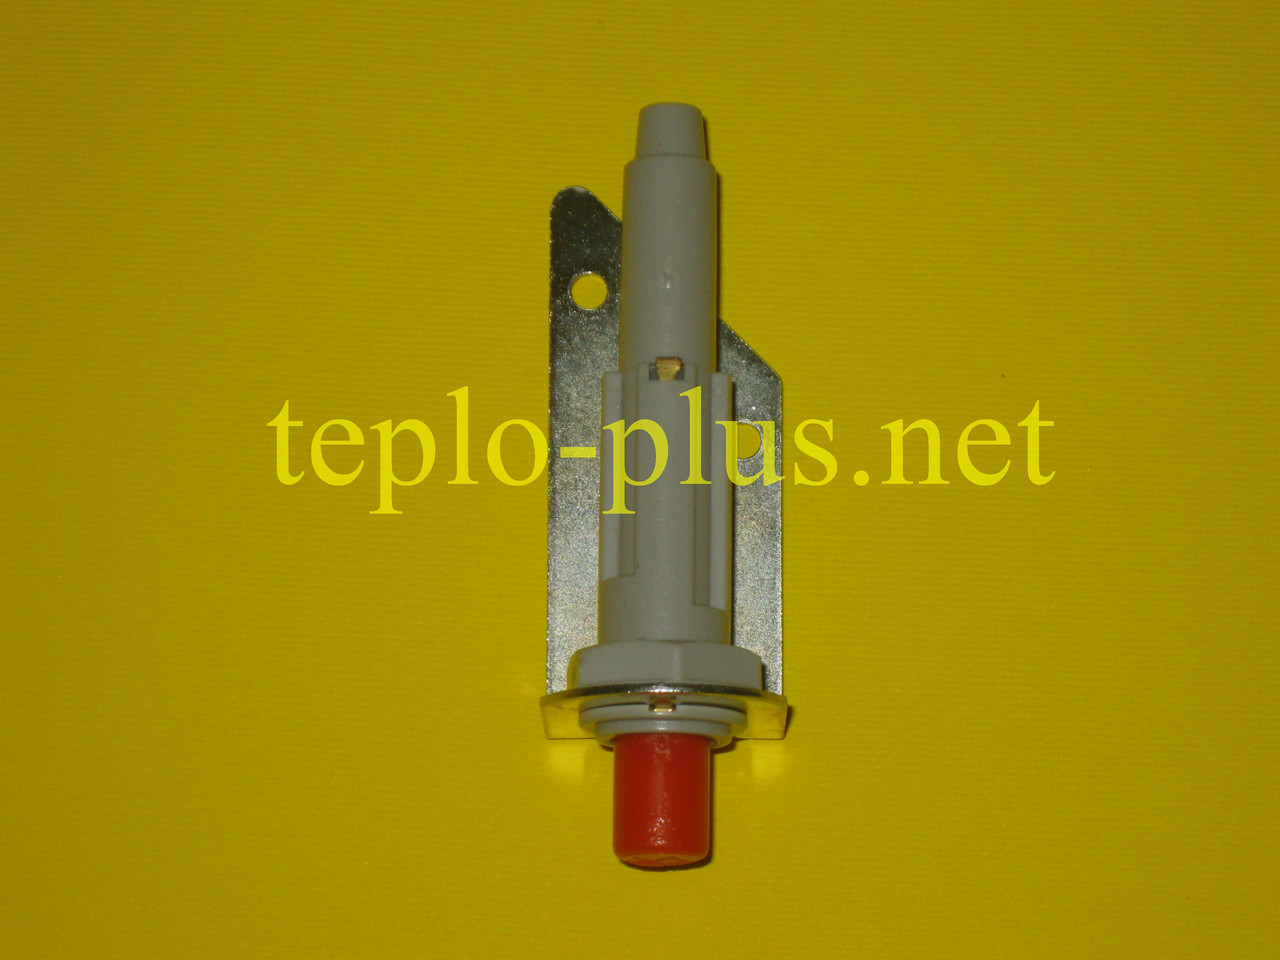 Пьезоконопка (пьезоэлемент) B81603 Beretta Idrabagno Aqua 11, 14, фото 3